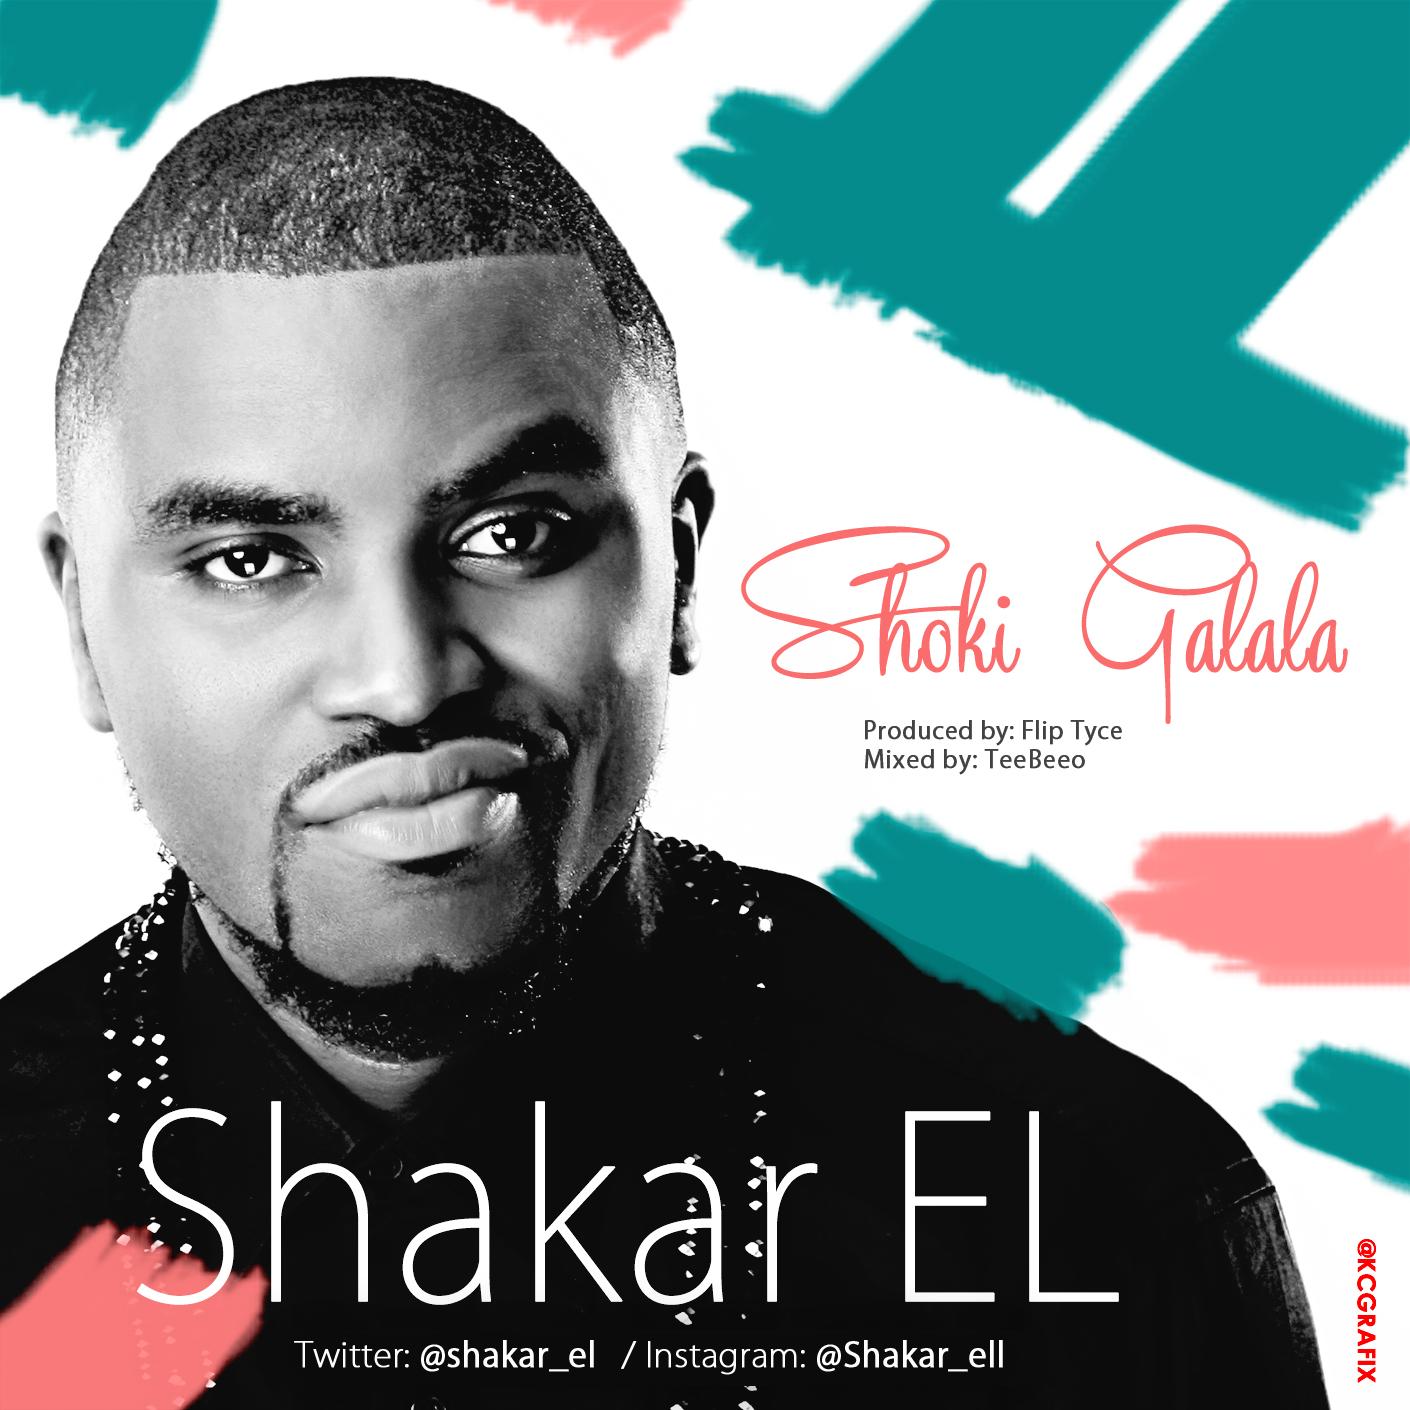 Shakar EL- Shoki-Galala -Art-tooXclusive.com